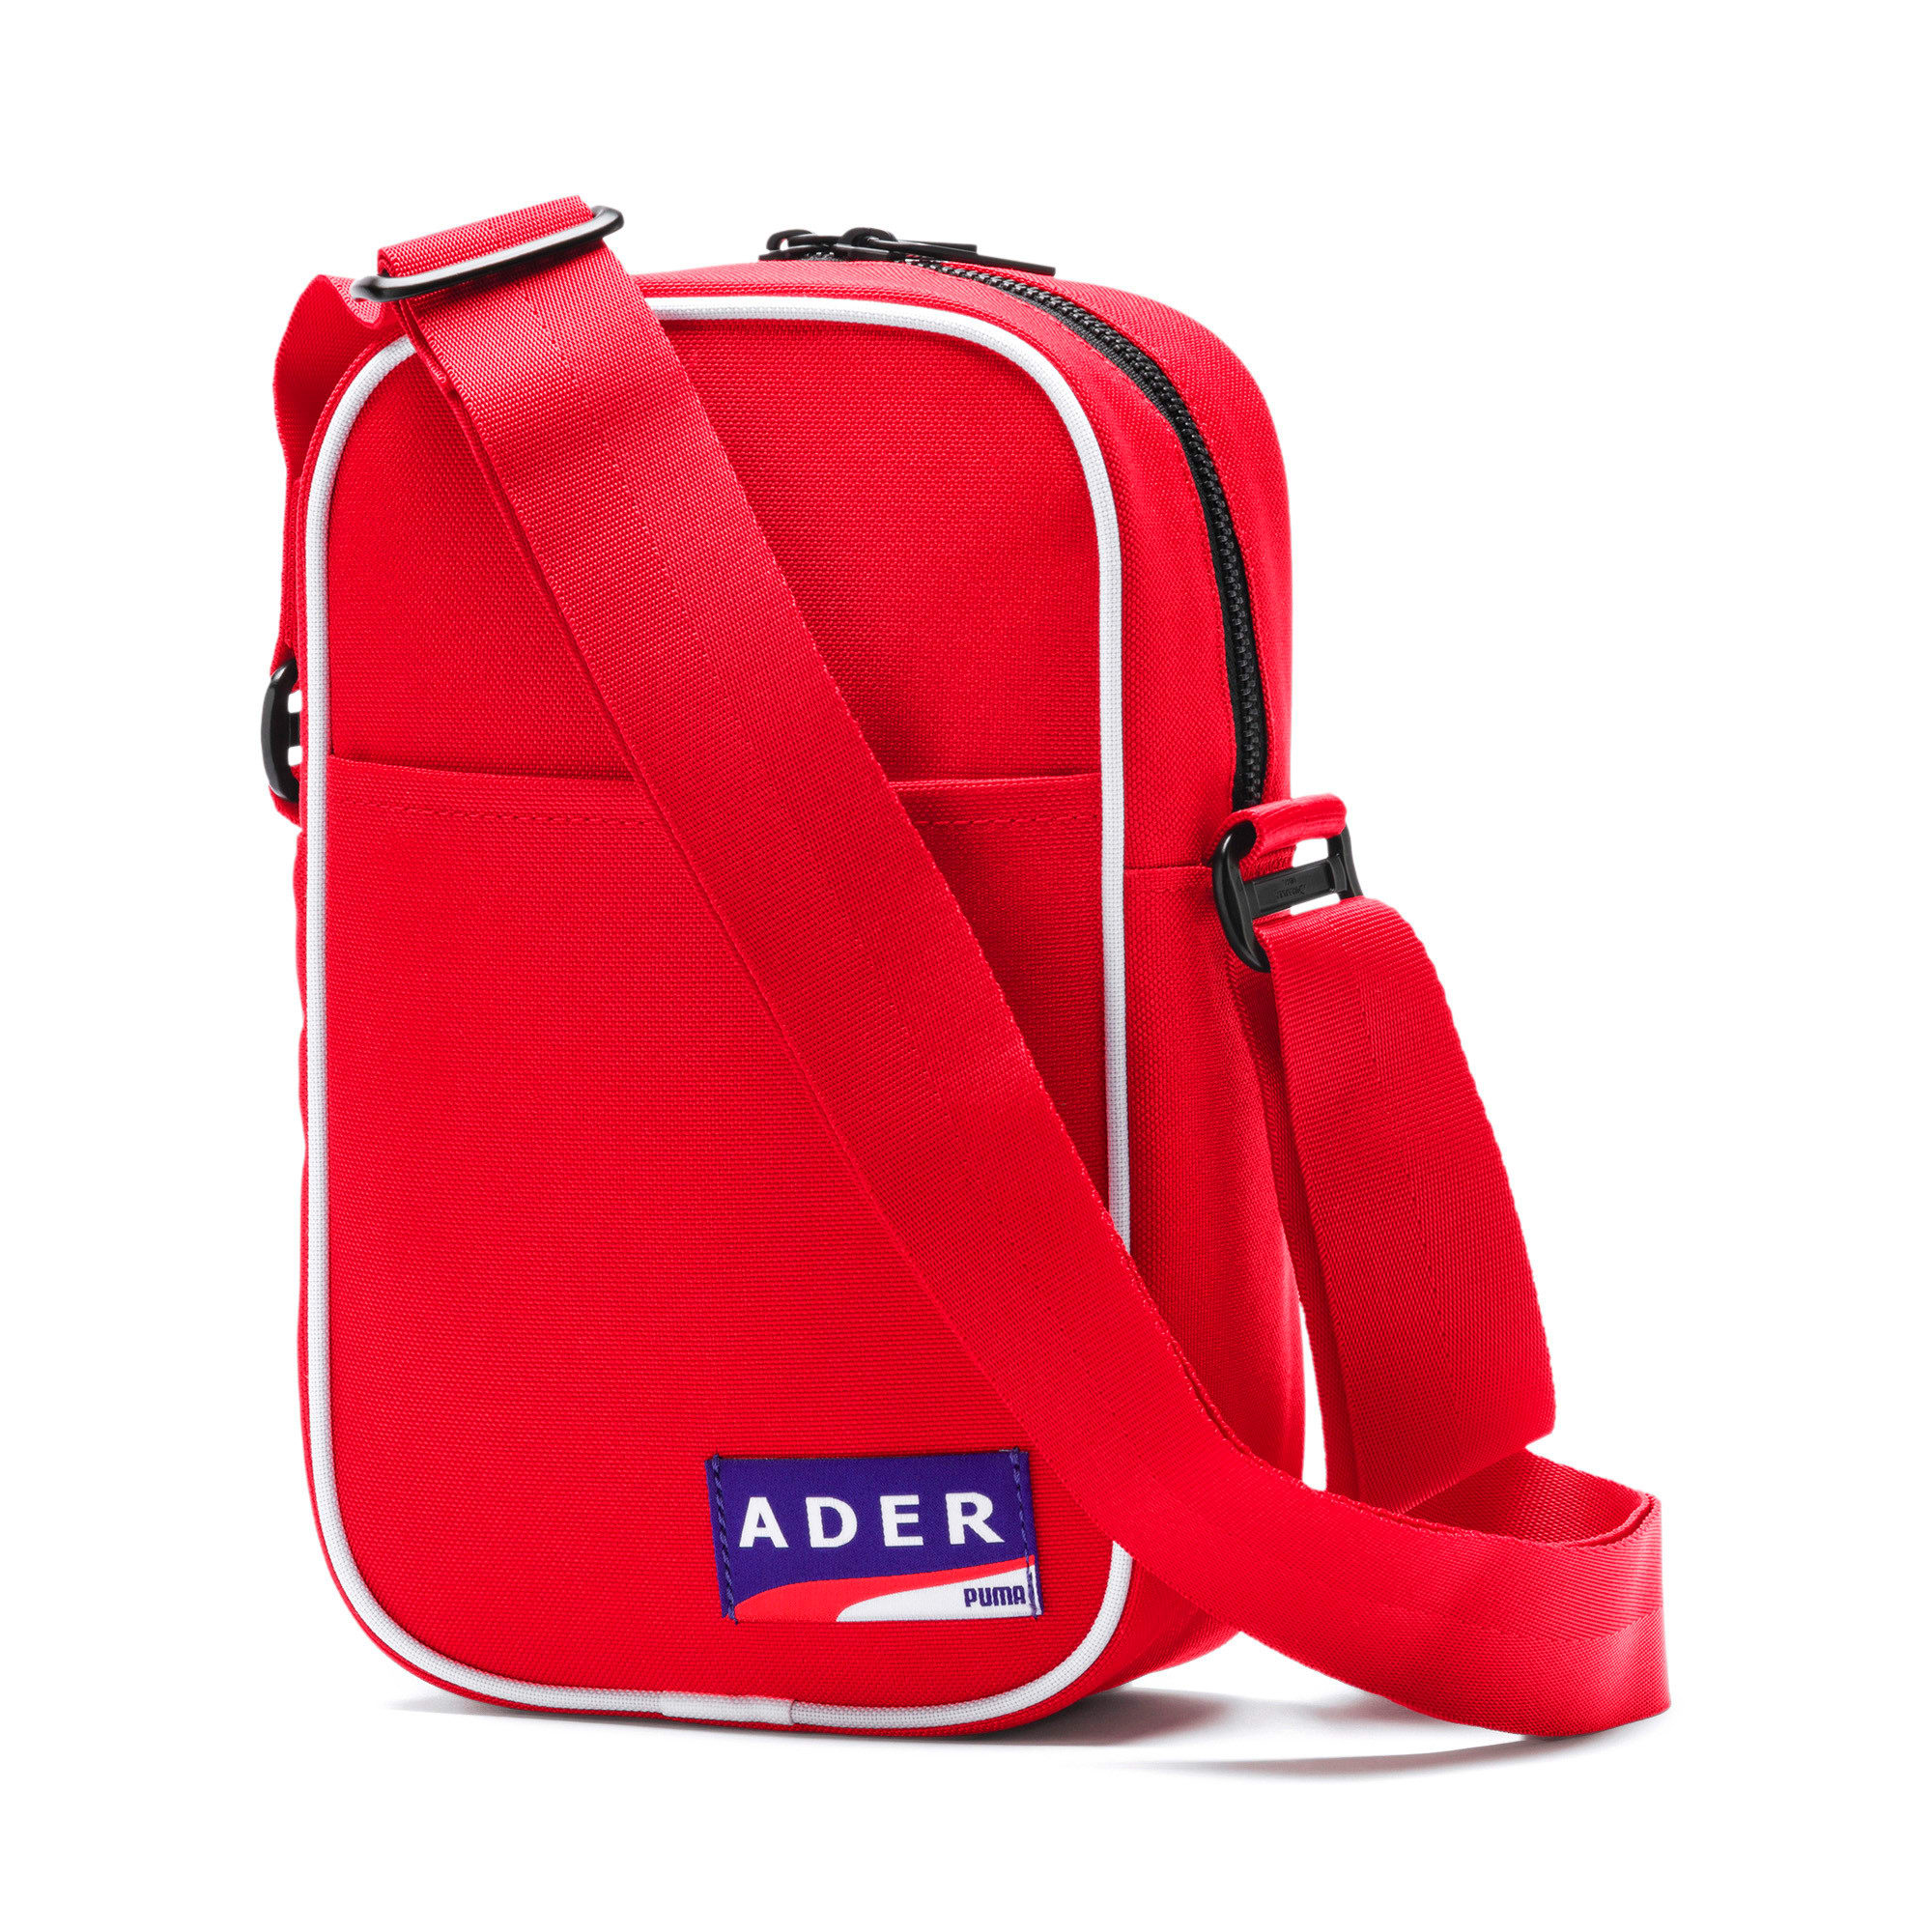 Thumbnail 8 of PUMA x ADER ERROR Portable Bag, Puma Red, medium